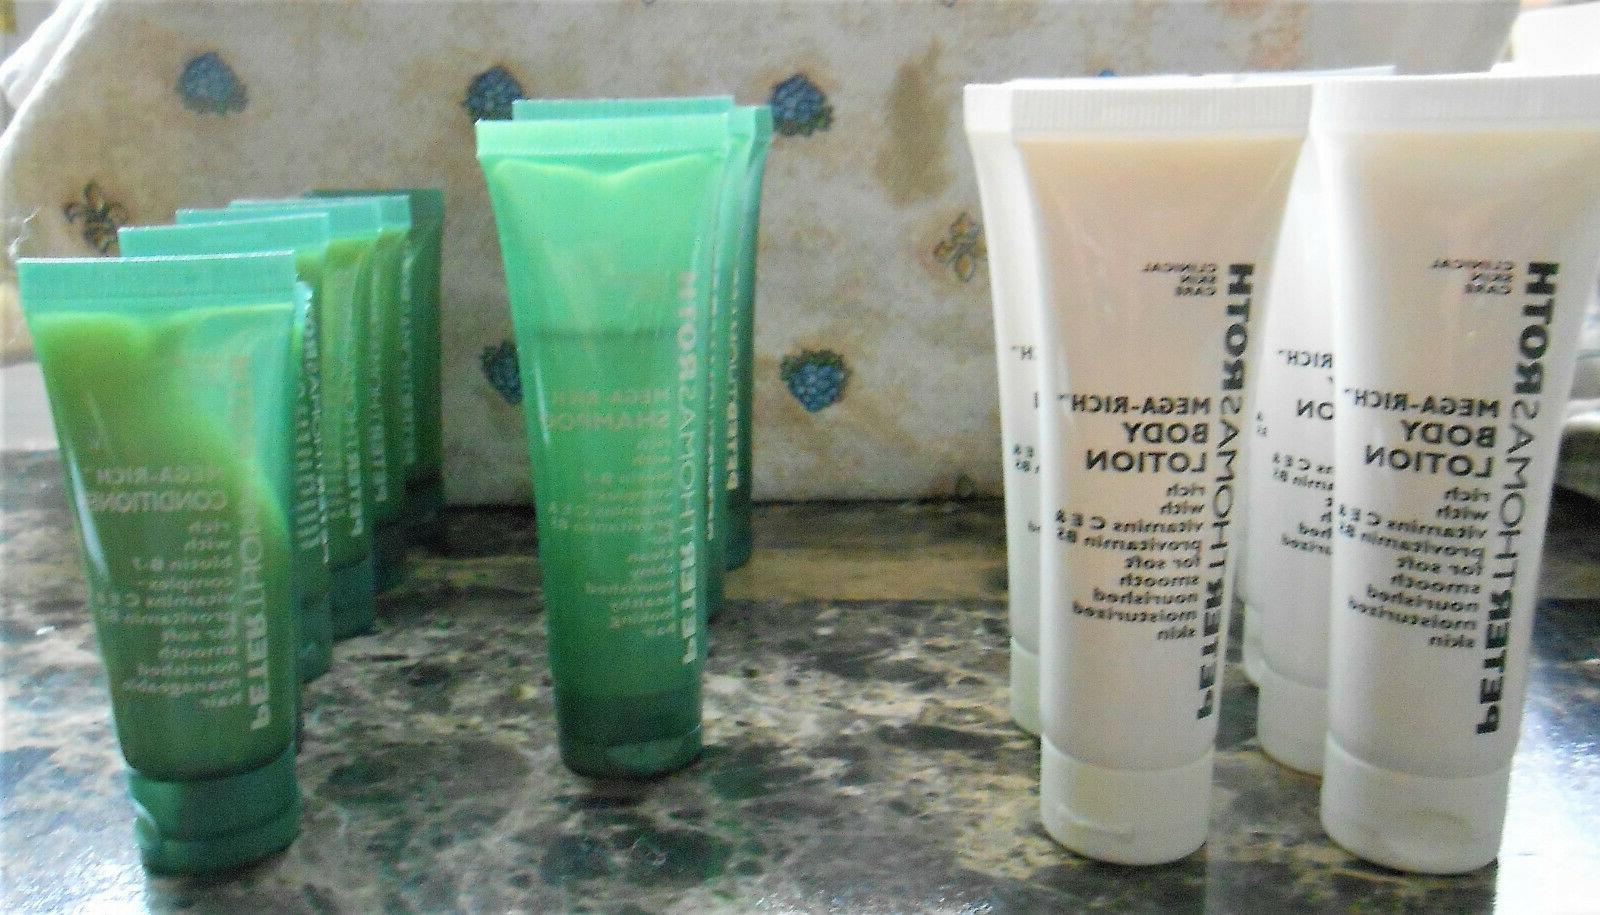 20pc biotin viac shampoo and conditioner mega